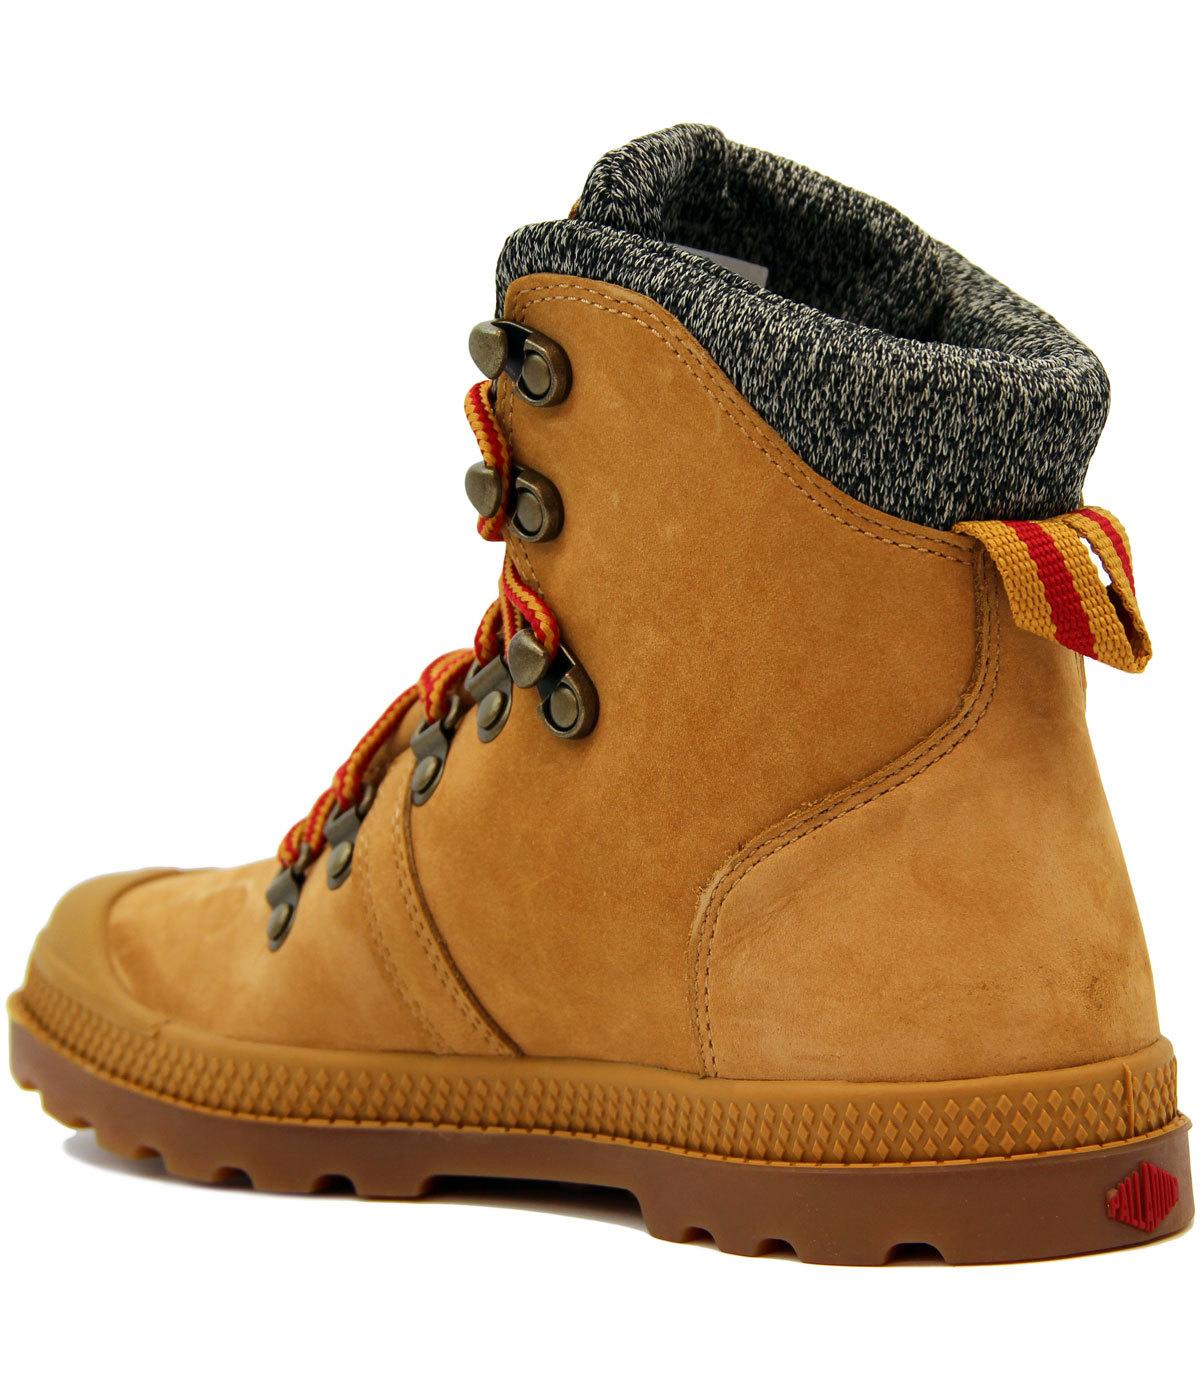 5fe8b1e6078 Pallabrouse Hikr LP PALLADIUM Retro Hiking Boots A